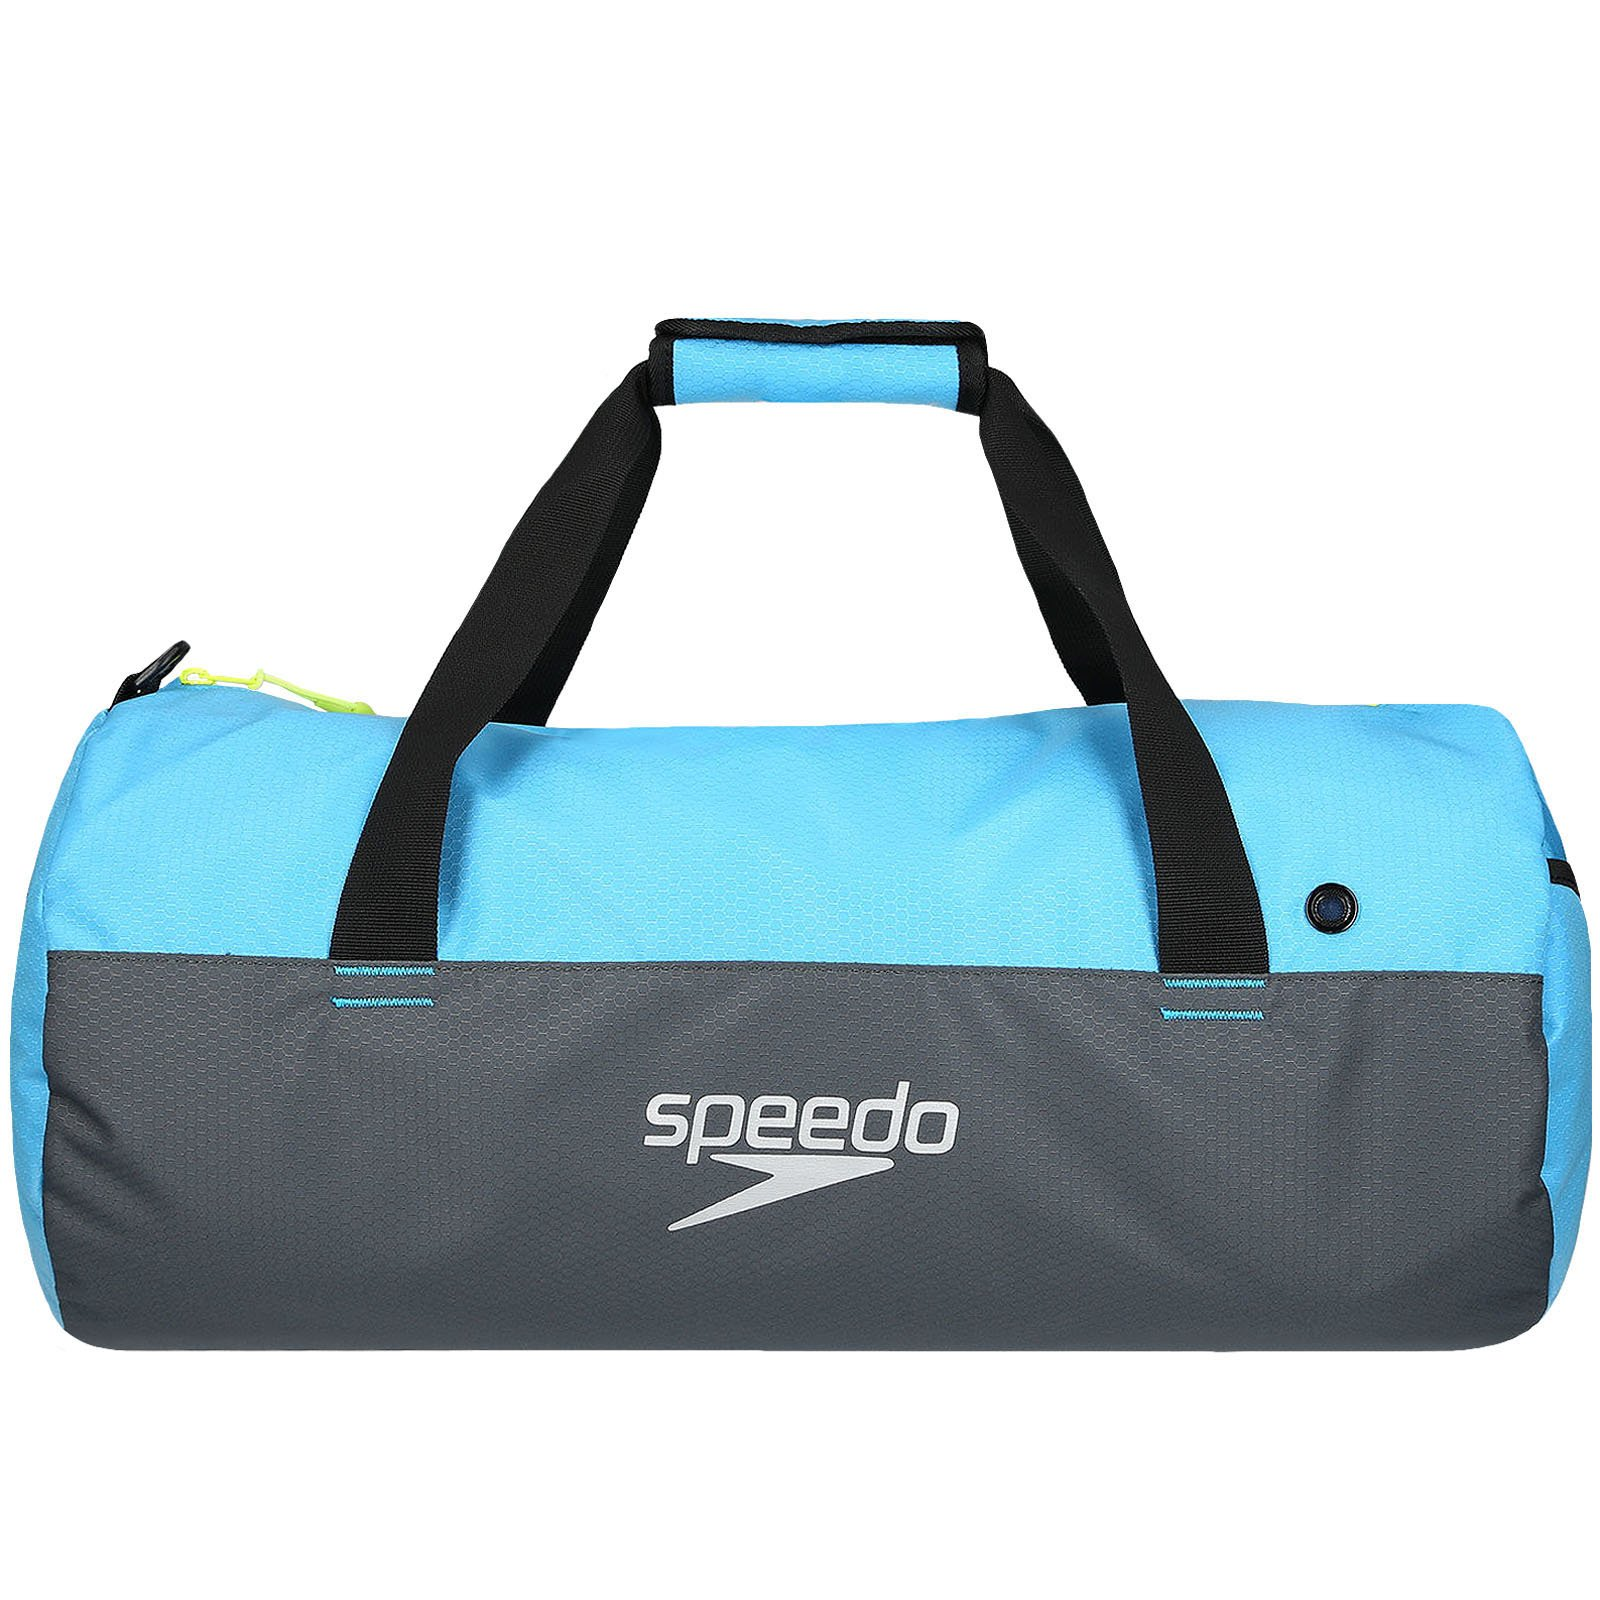 Speedo Waterproof Gym Pool 30L Duffel - Grey/Blue - OS